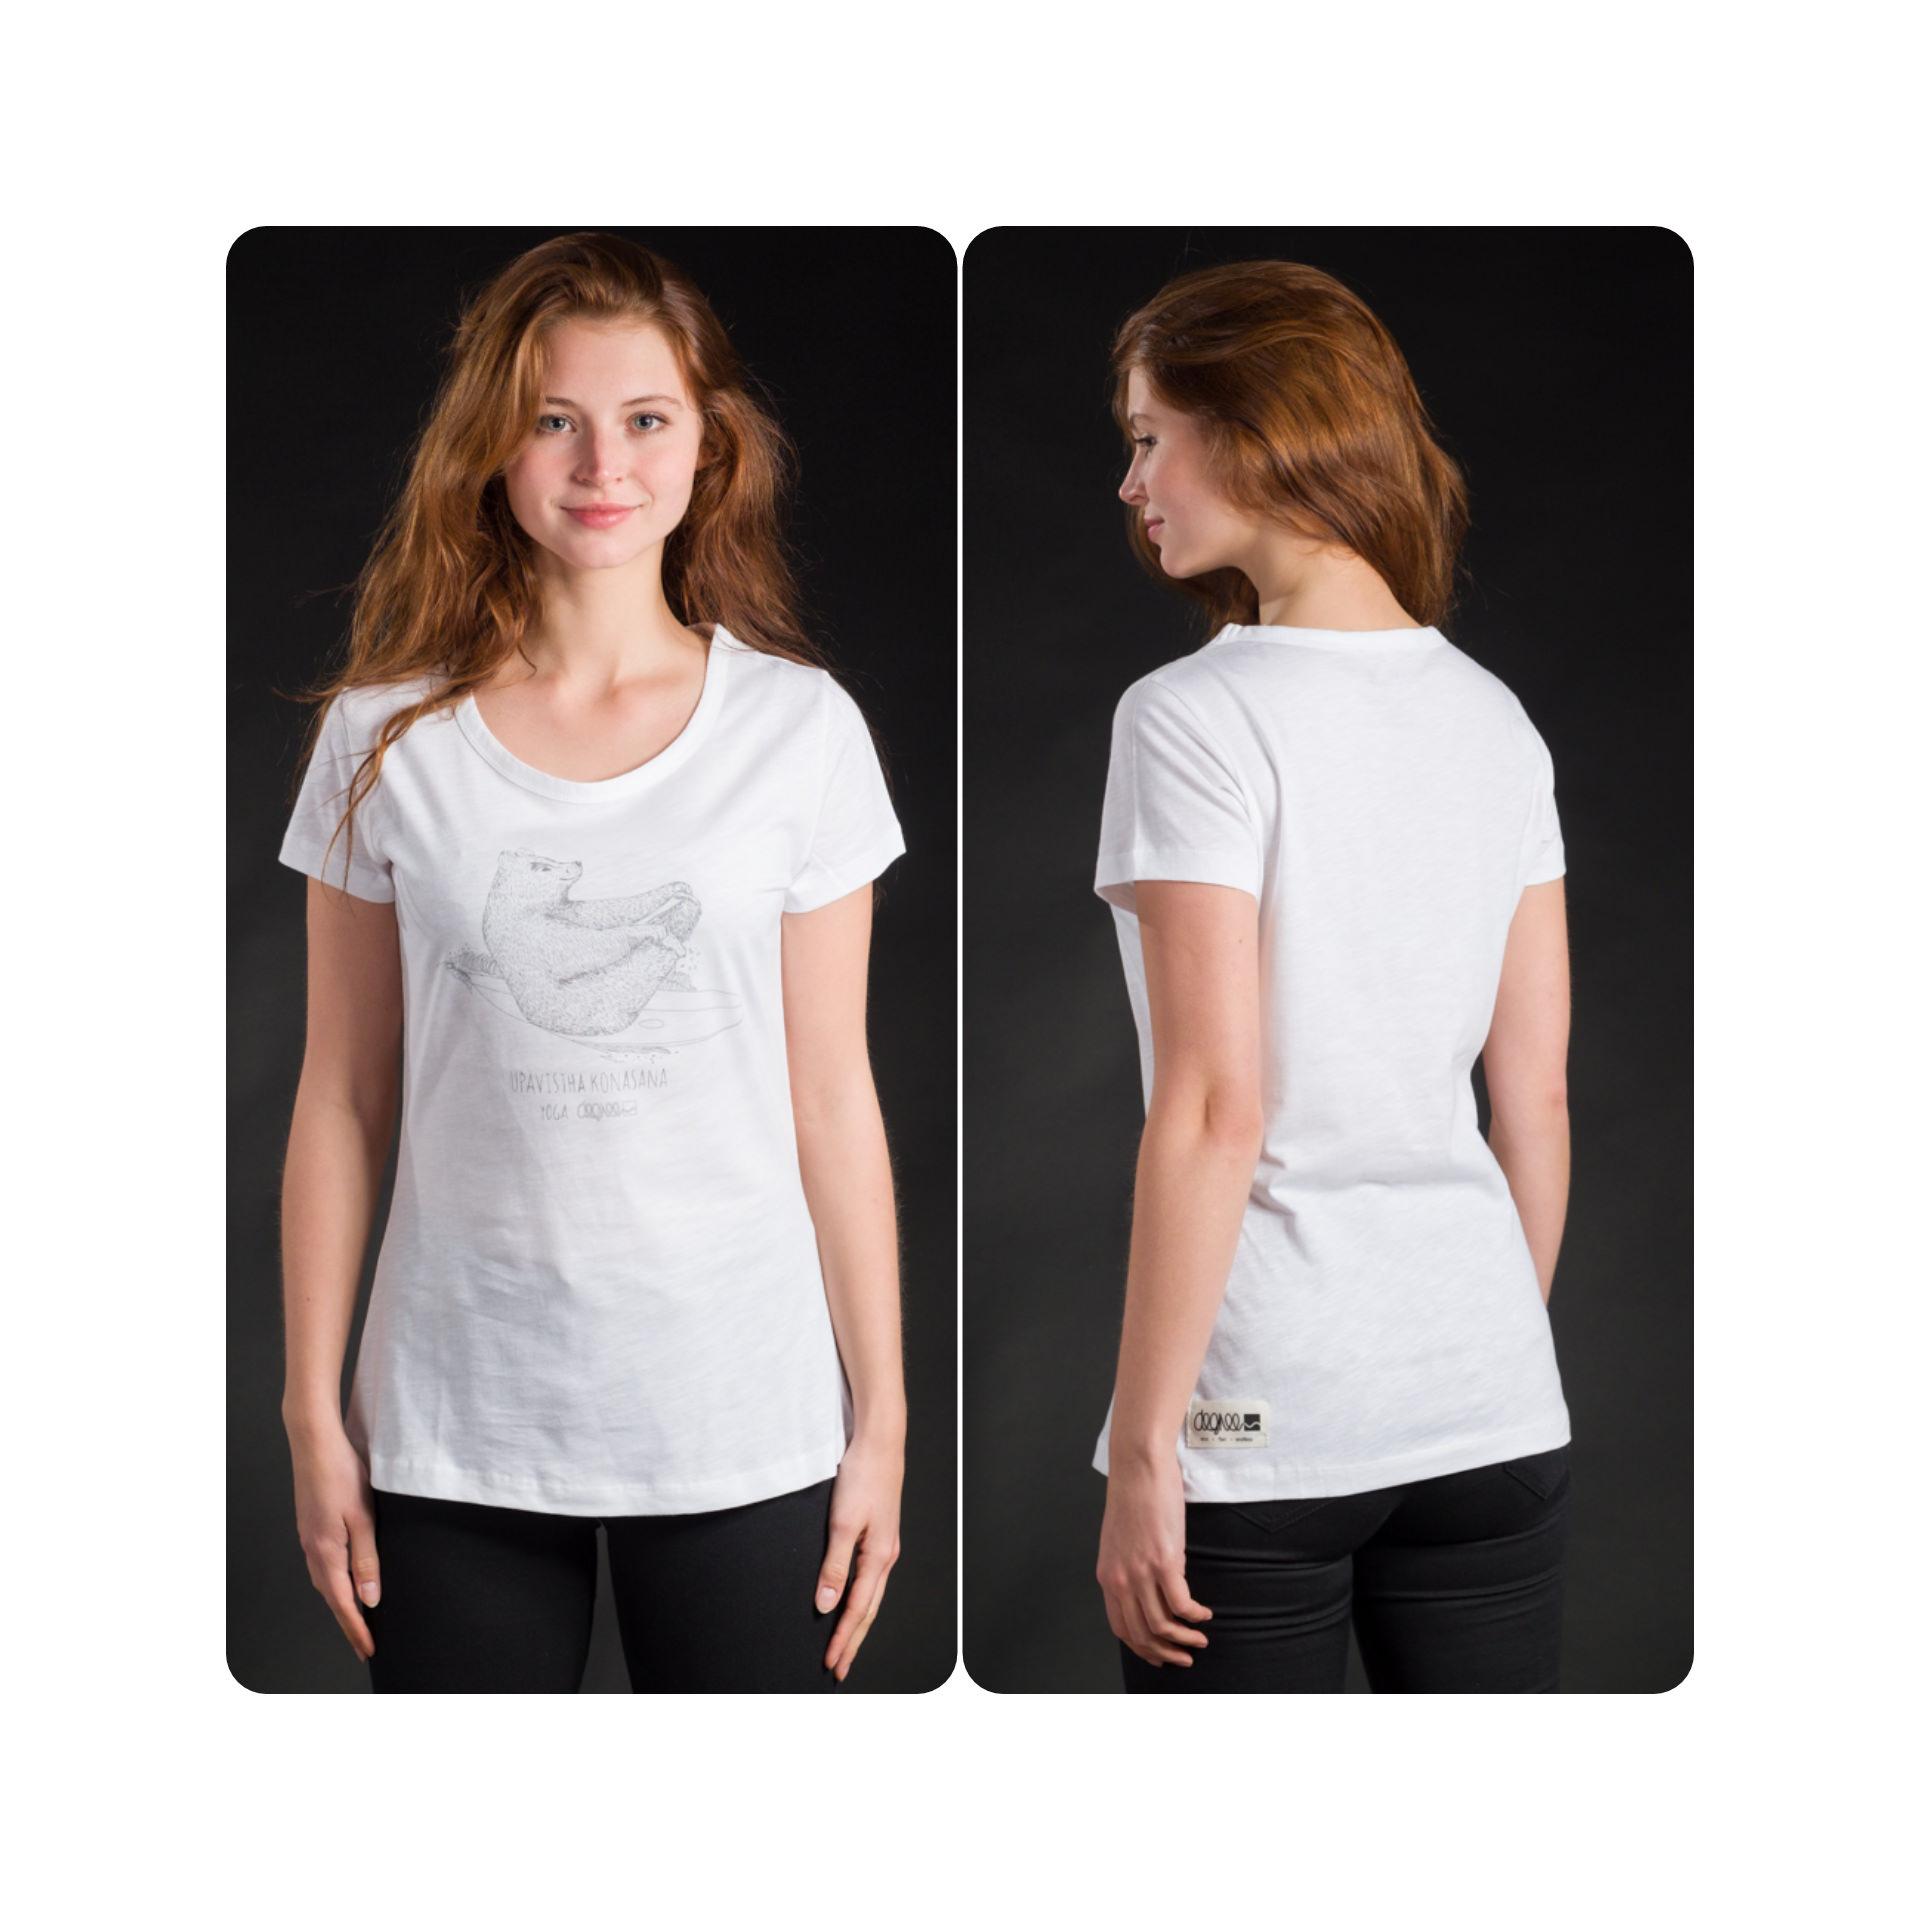 vegane kleidung online shop   fairkleidet